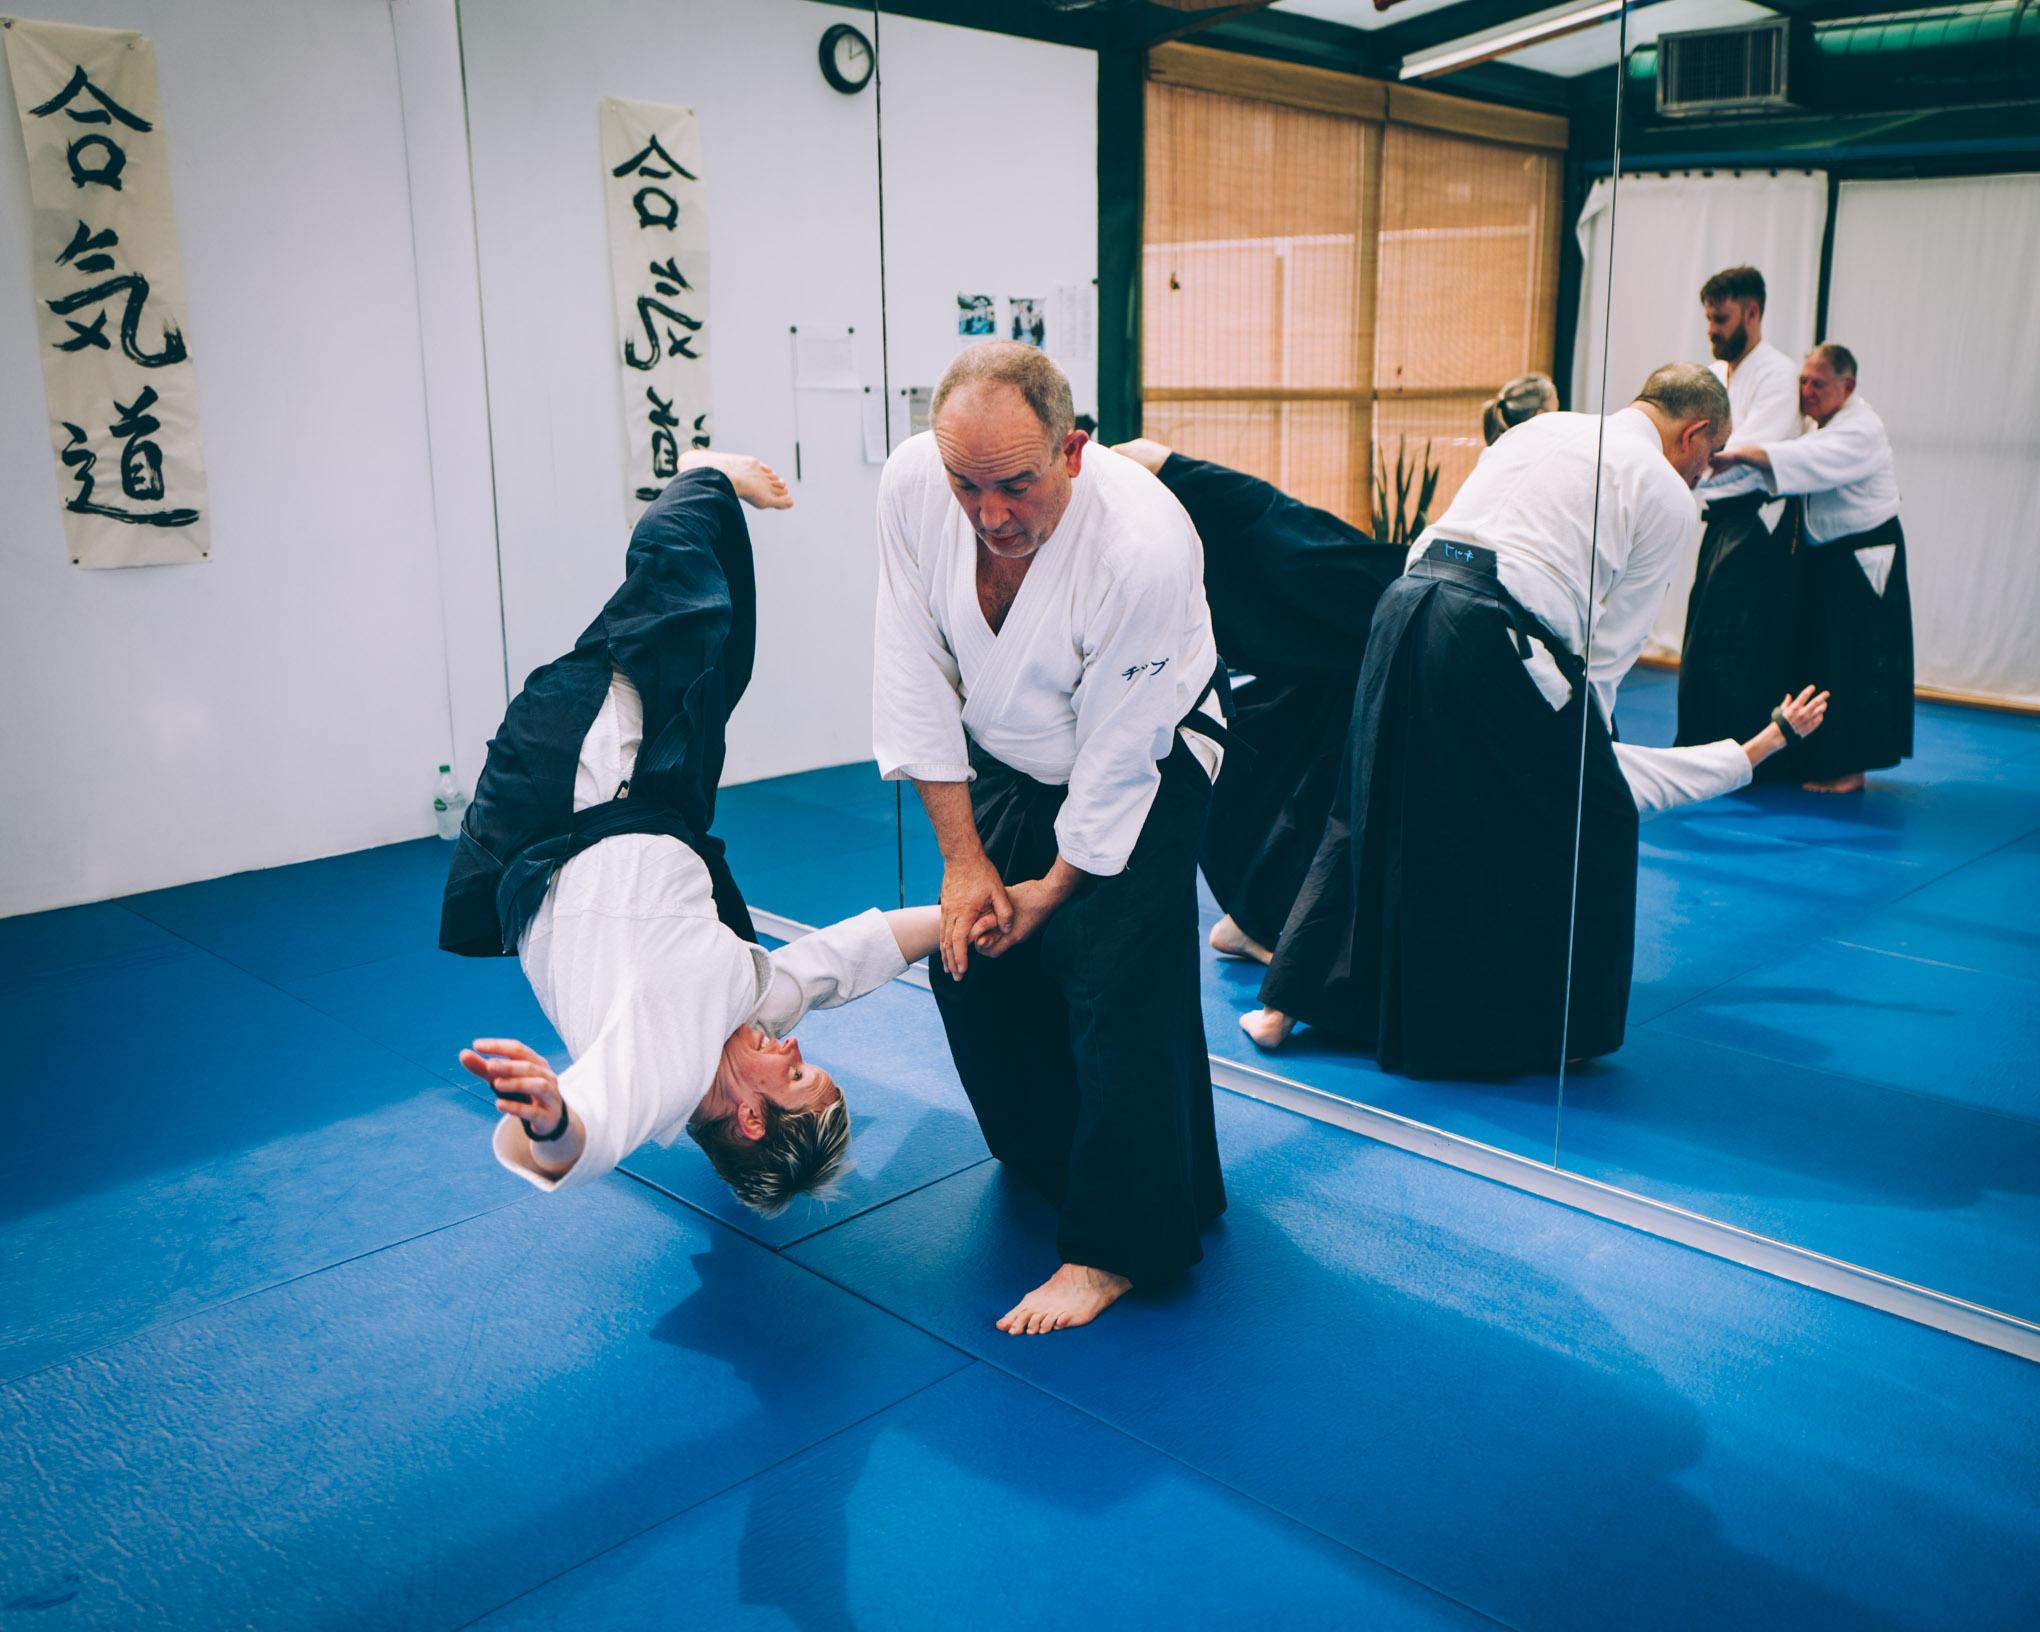 Two black belts practice kotegaeshi, a standard Aikido technique, at Bushwick Dojo in Brooklyn, New York